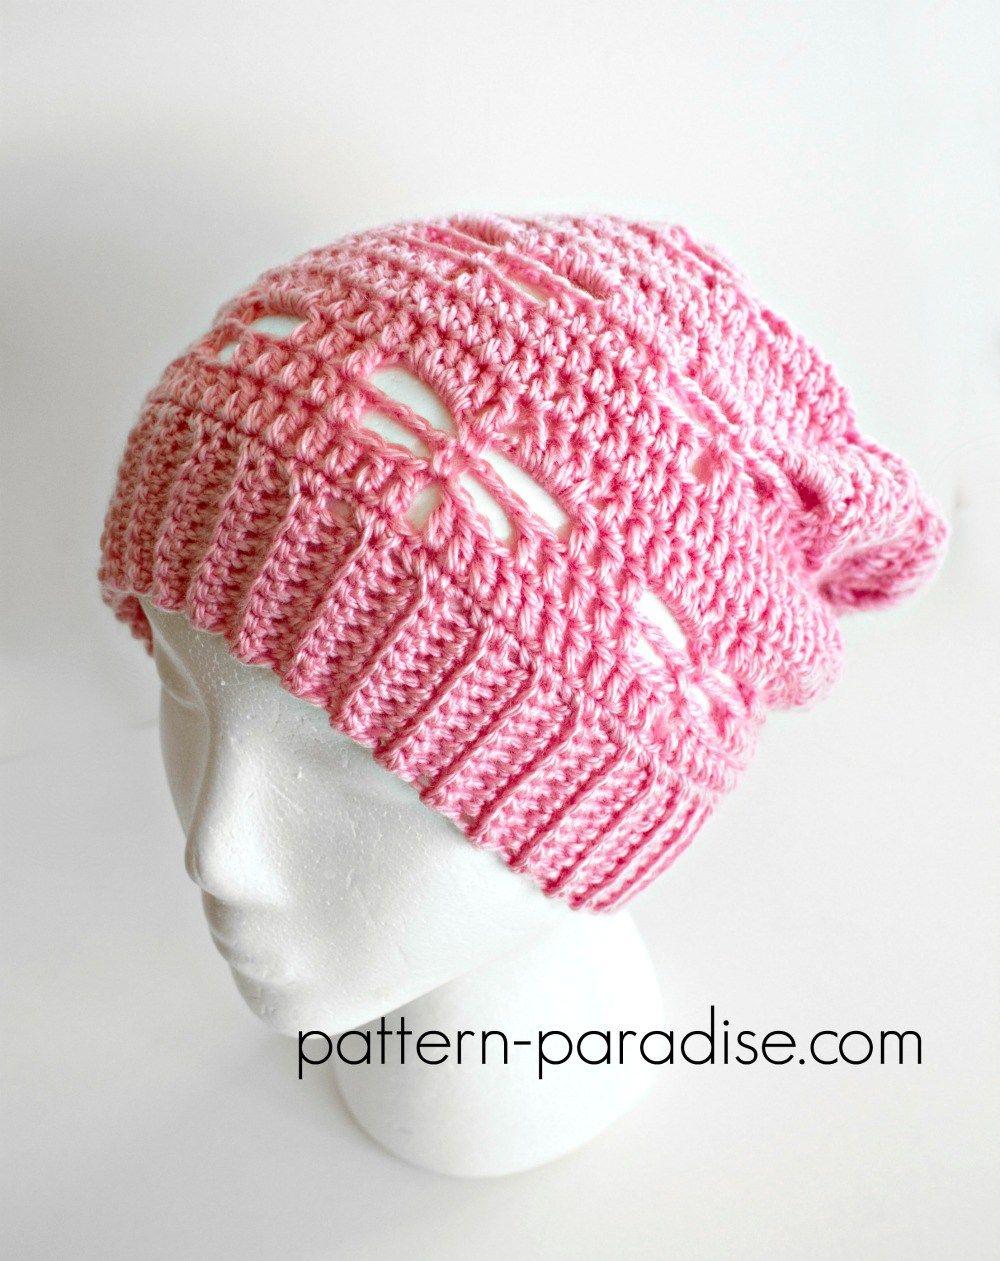 Free Crochet Pattern: Dragonfly Slouchy Hat | Pinterest | Artesanía